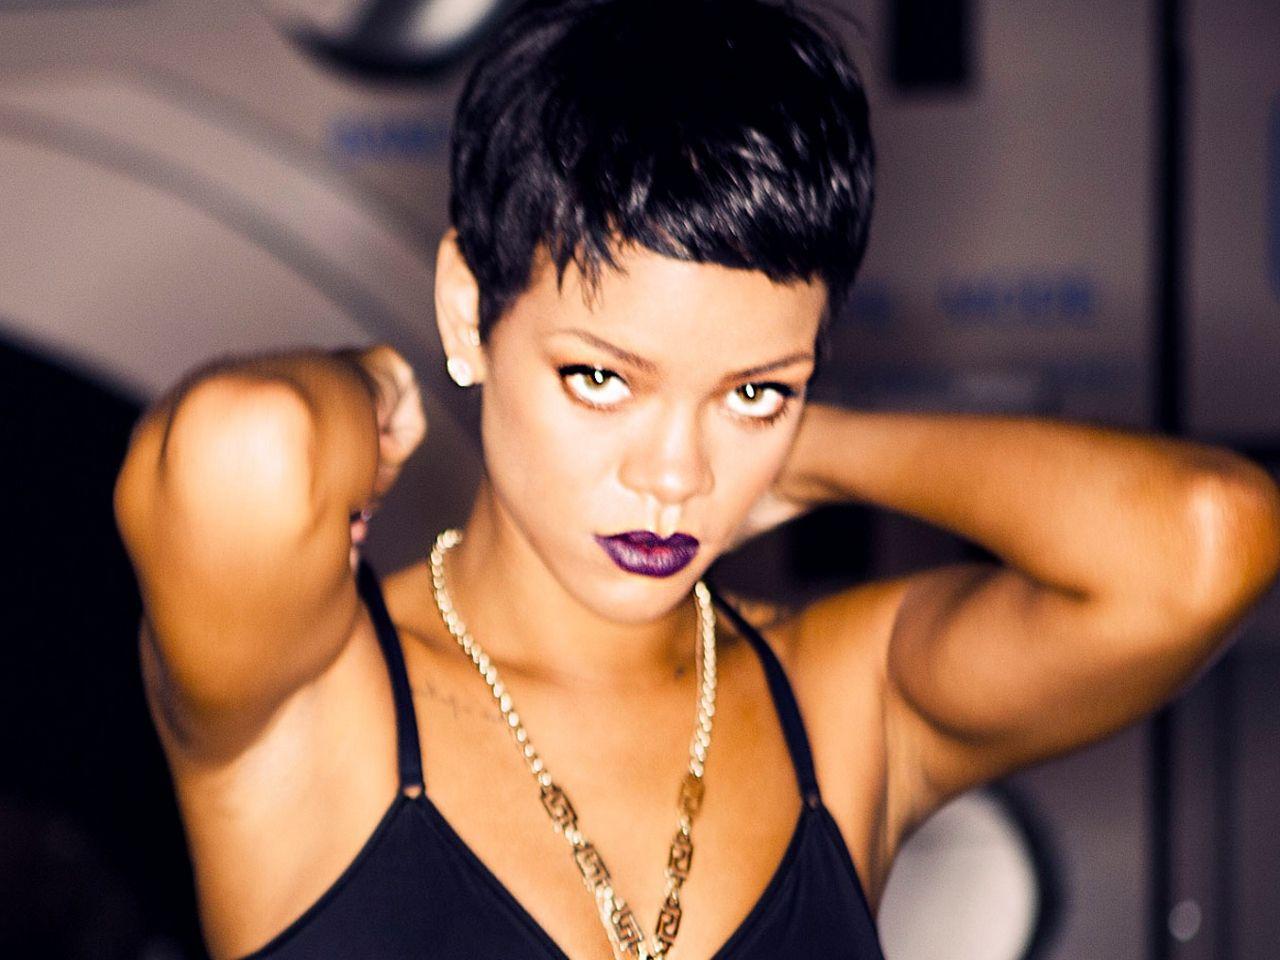 Rihanna Wallpaper Rihanna Unapologetic Promo Rihanna Short Hair Rihanna Hairstyles Short Hair Styles